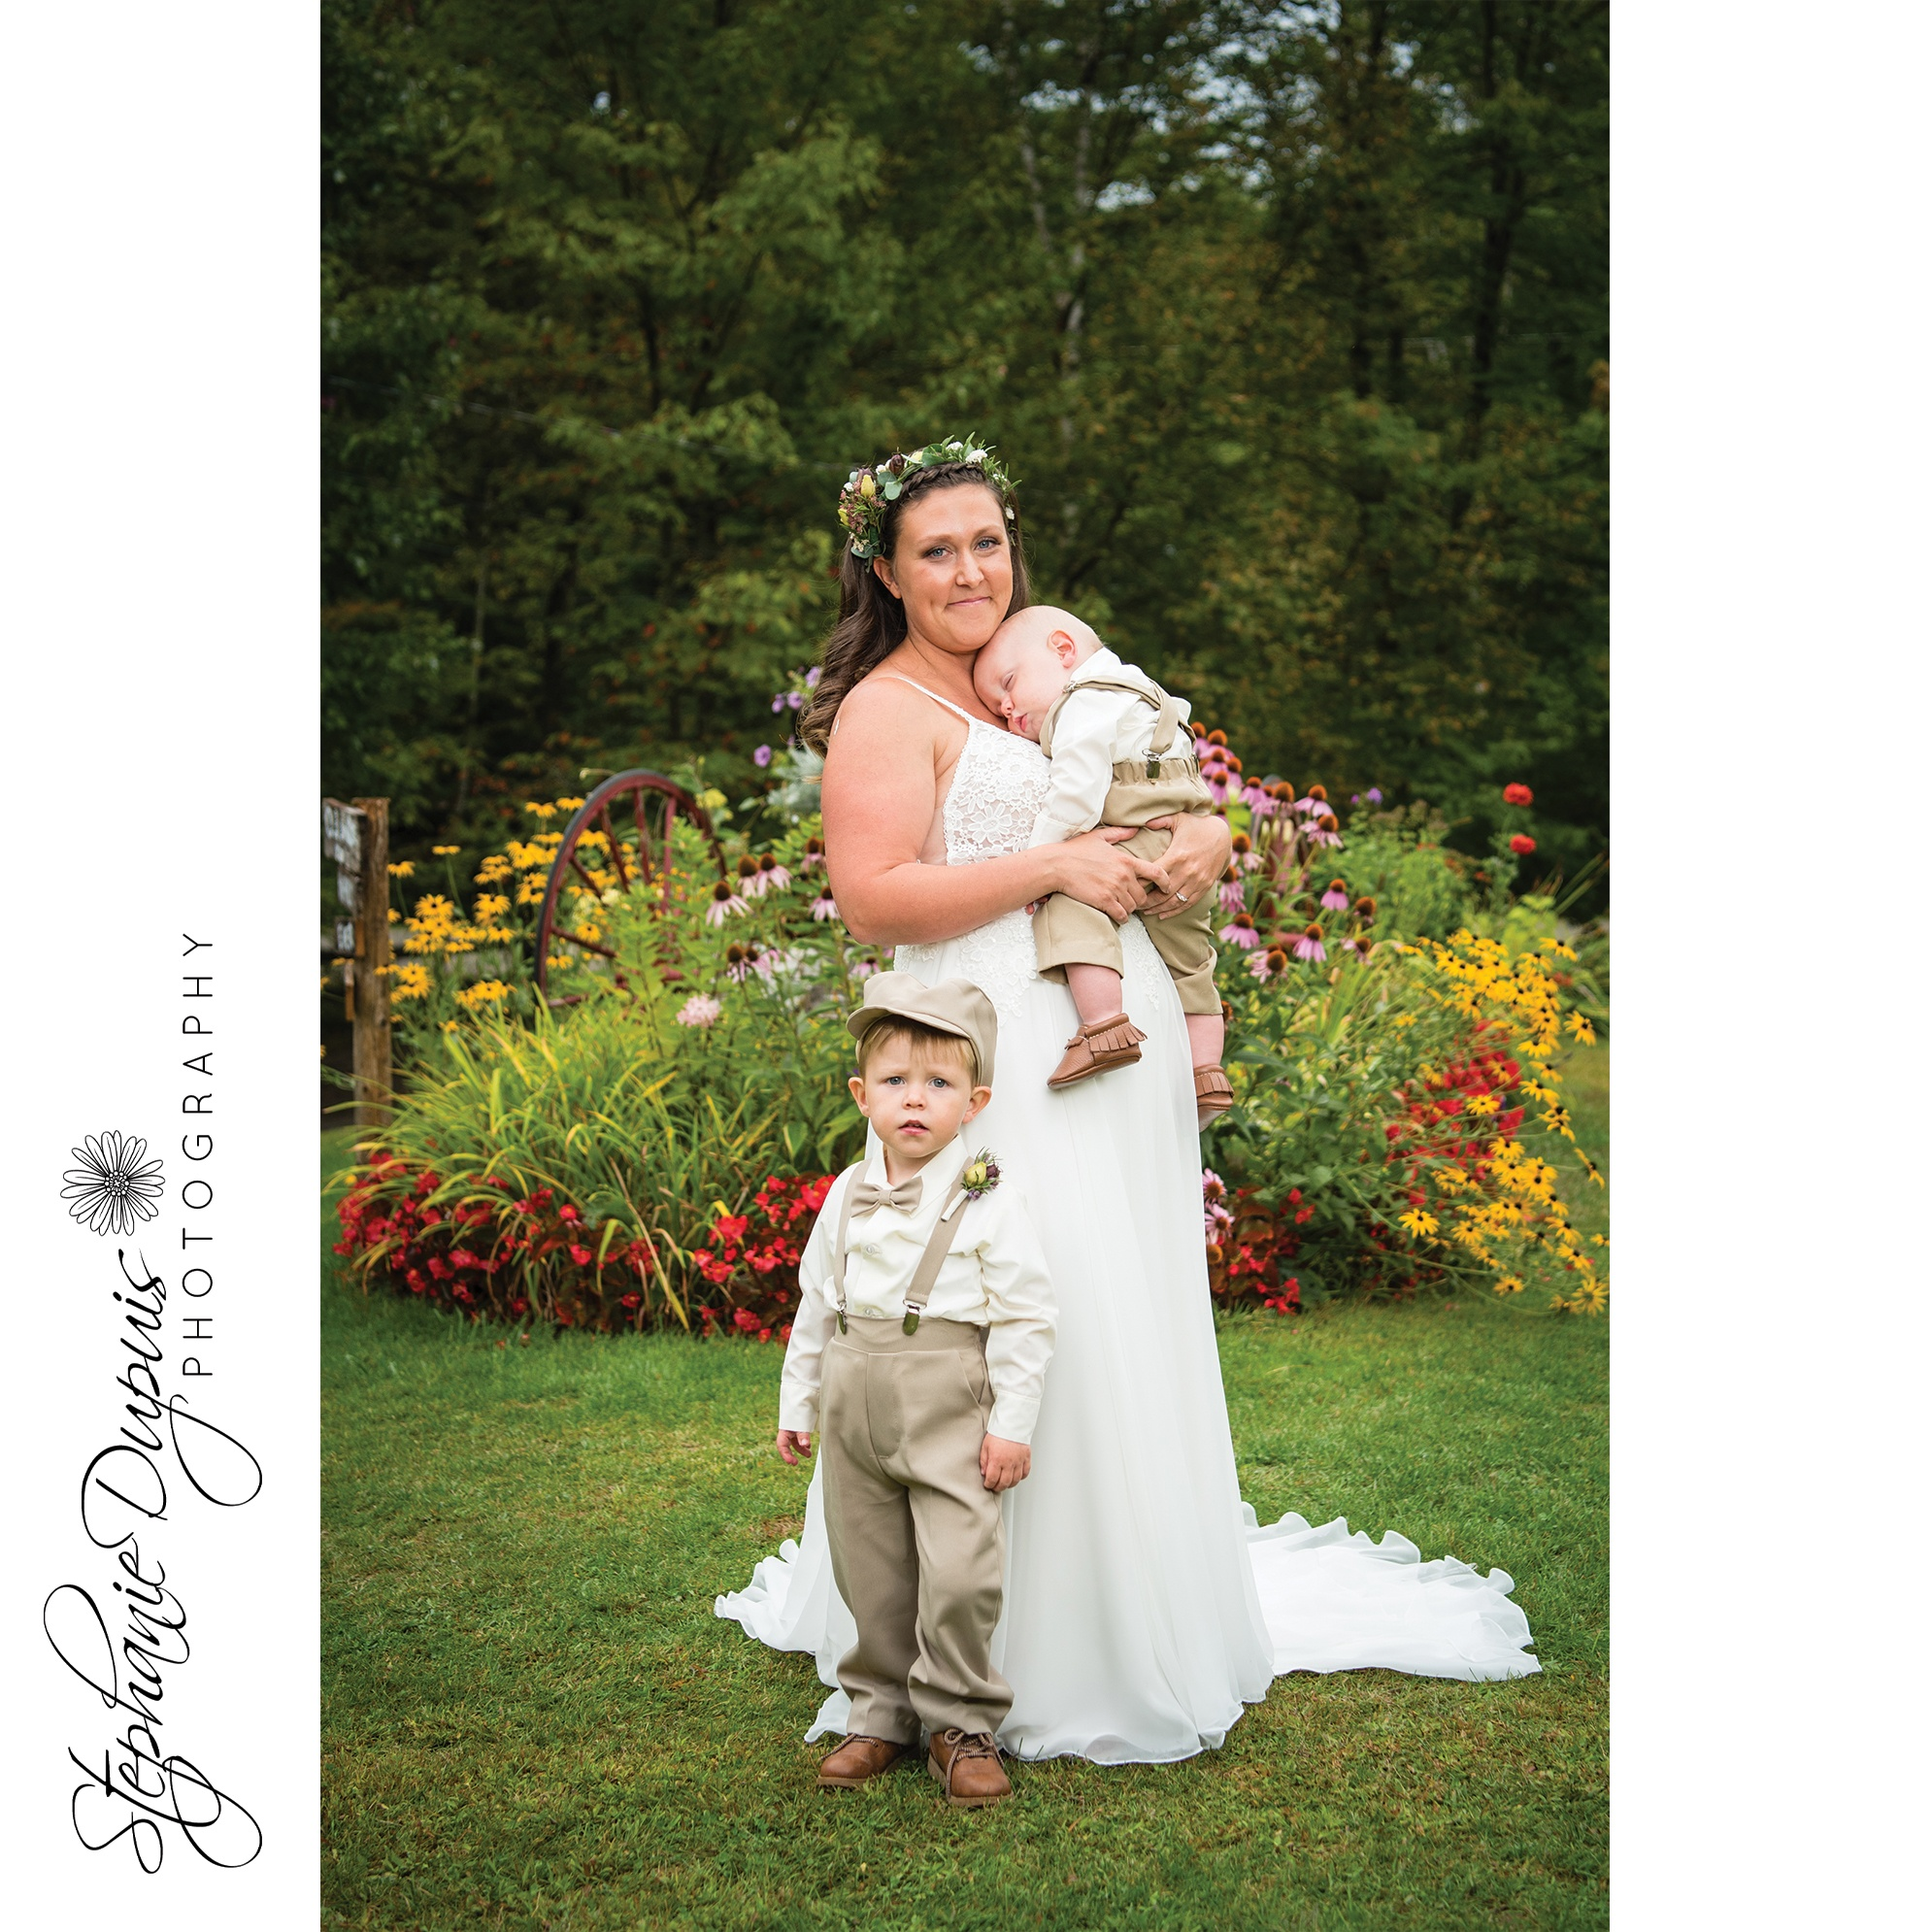 Hicks Wedding 5 - Portfolio: Hick's Wedding